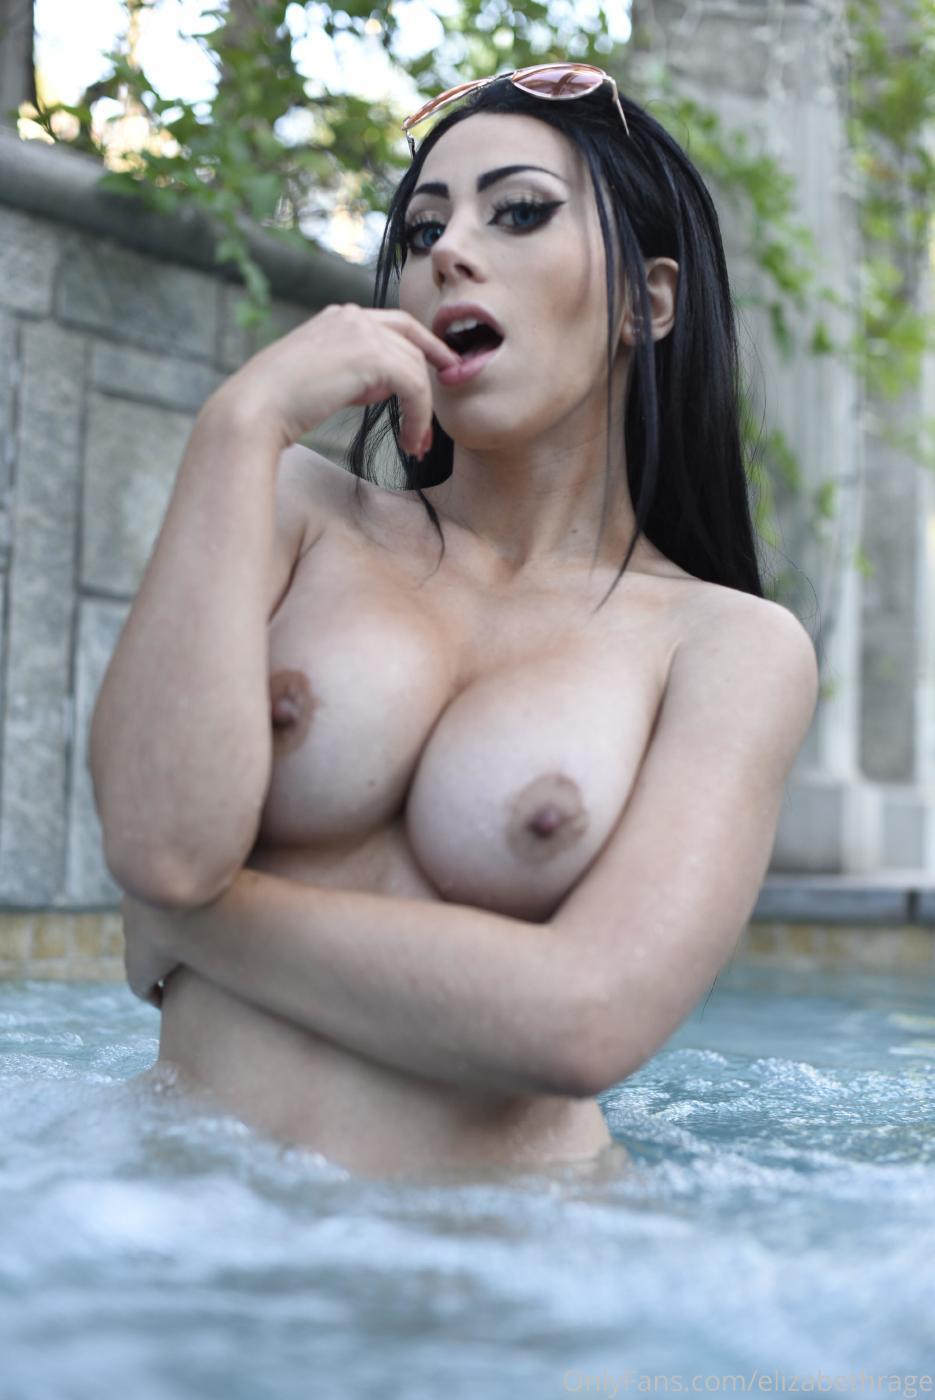 Elizabeth Rage Nude Outdoor Pool Onlyfans Set Leaked 0023